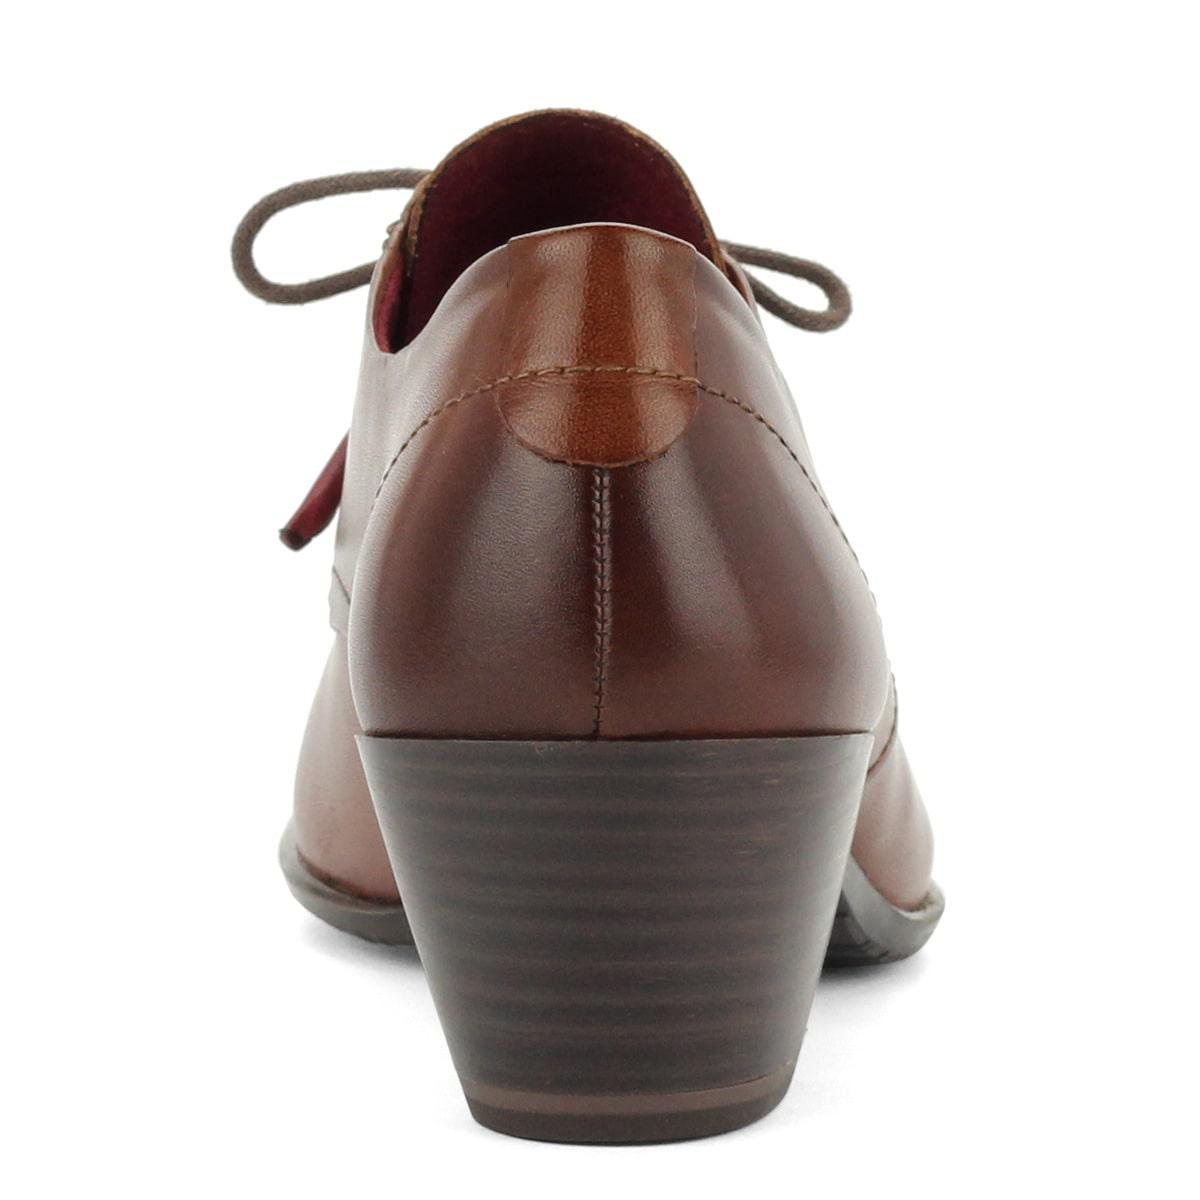 Fűzős Tamaris bőr cipő barna színben 6b20df5576